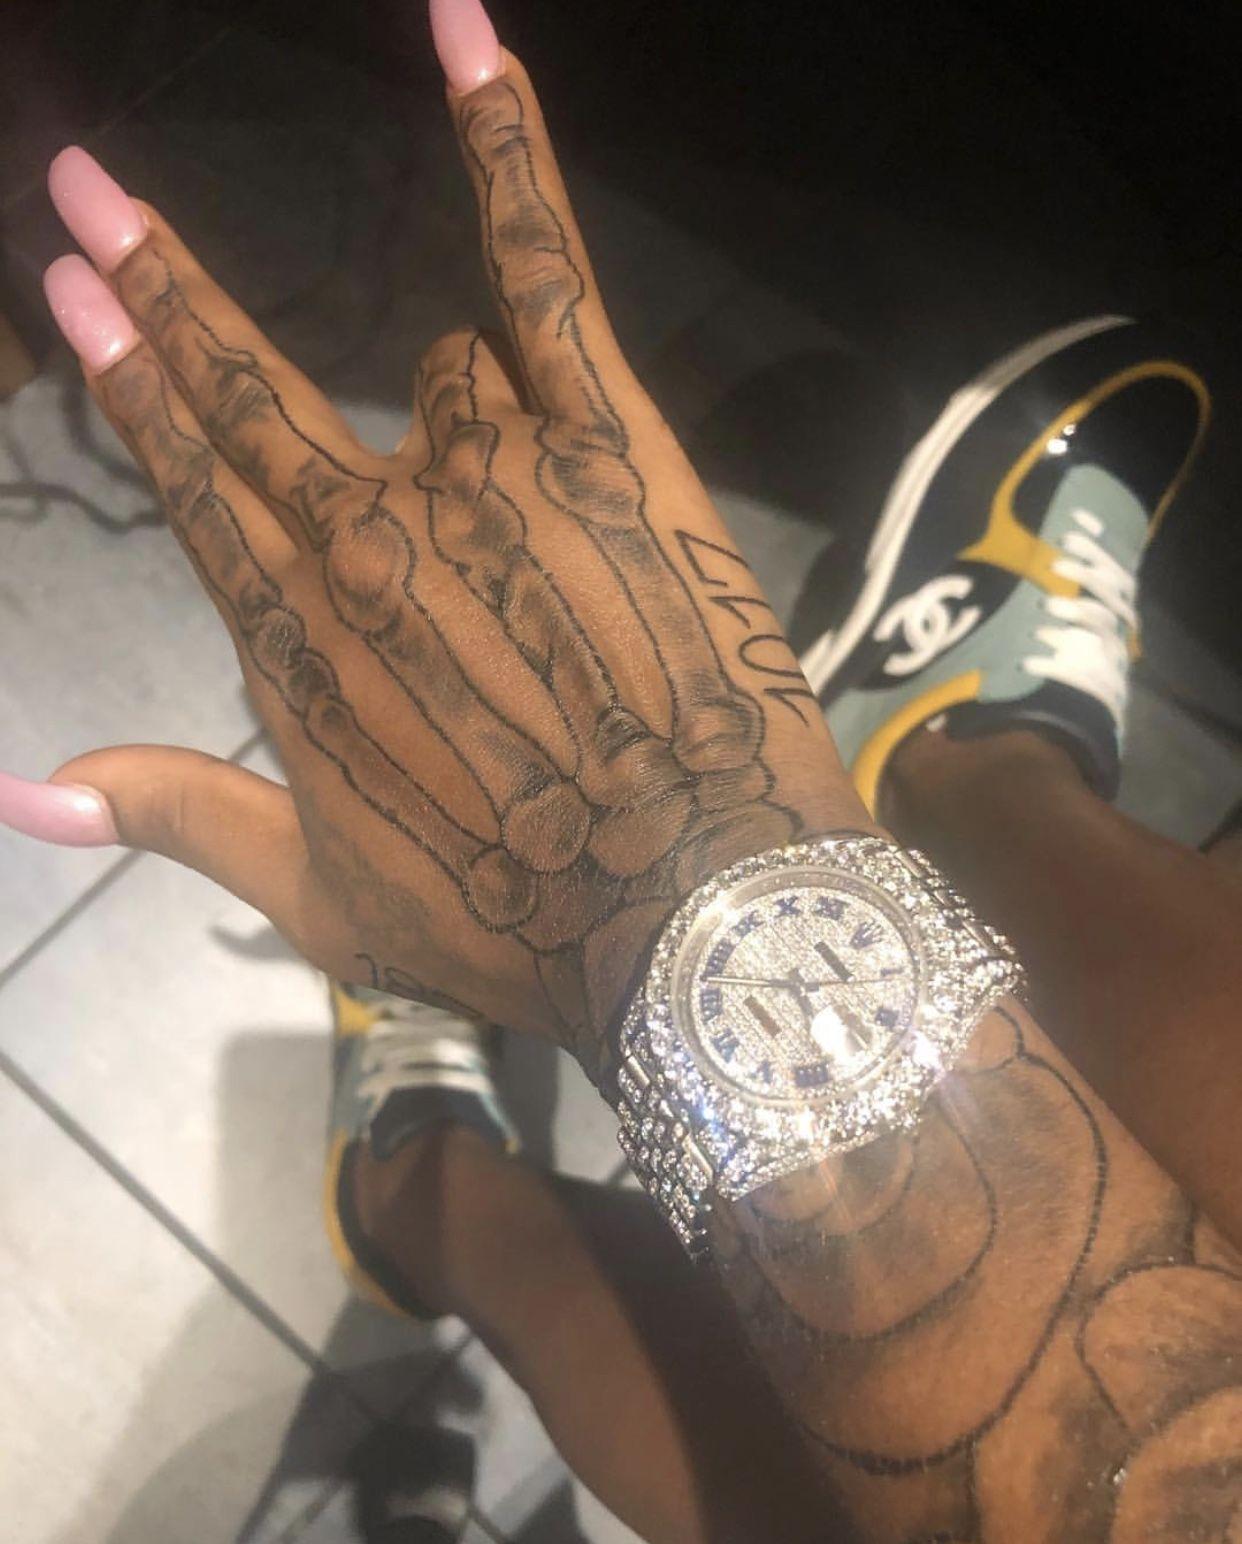 Ccurlzz Hand Tattoos Small Hand Tattoos Skeleton Hand Tattoo